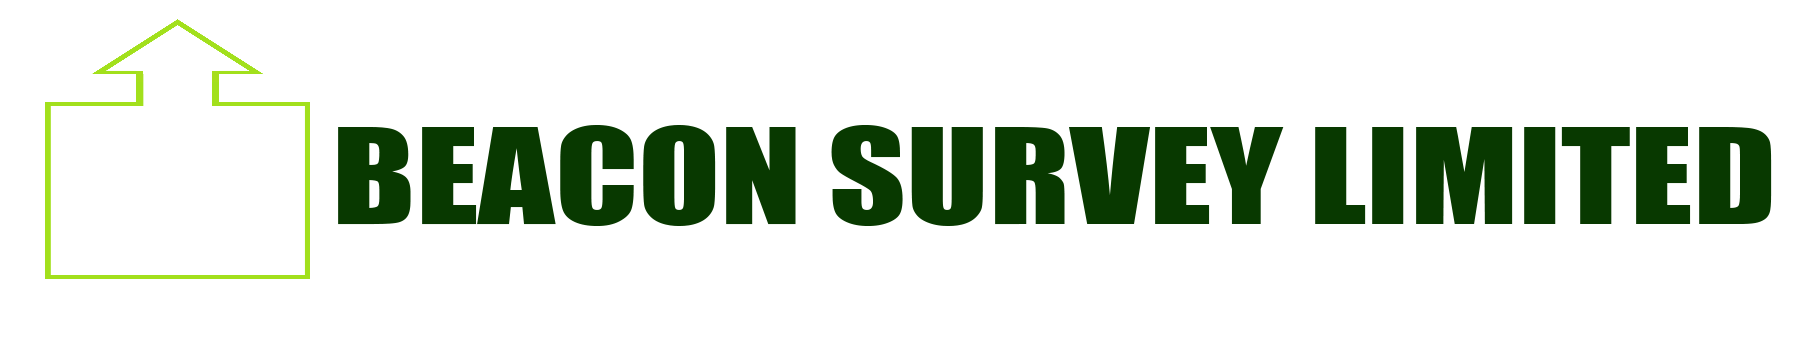 Beacon Survey Ghana -